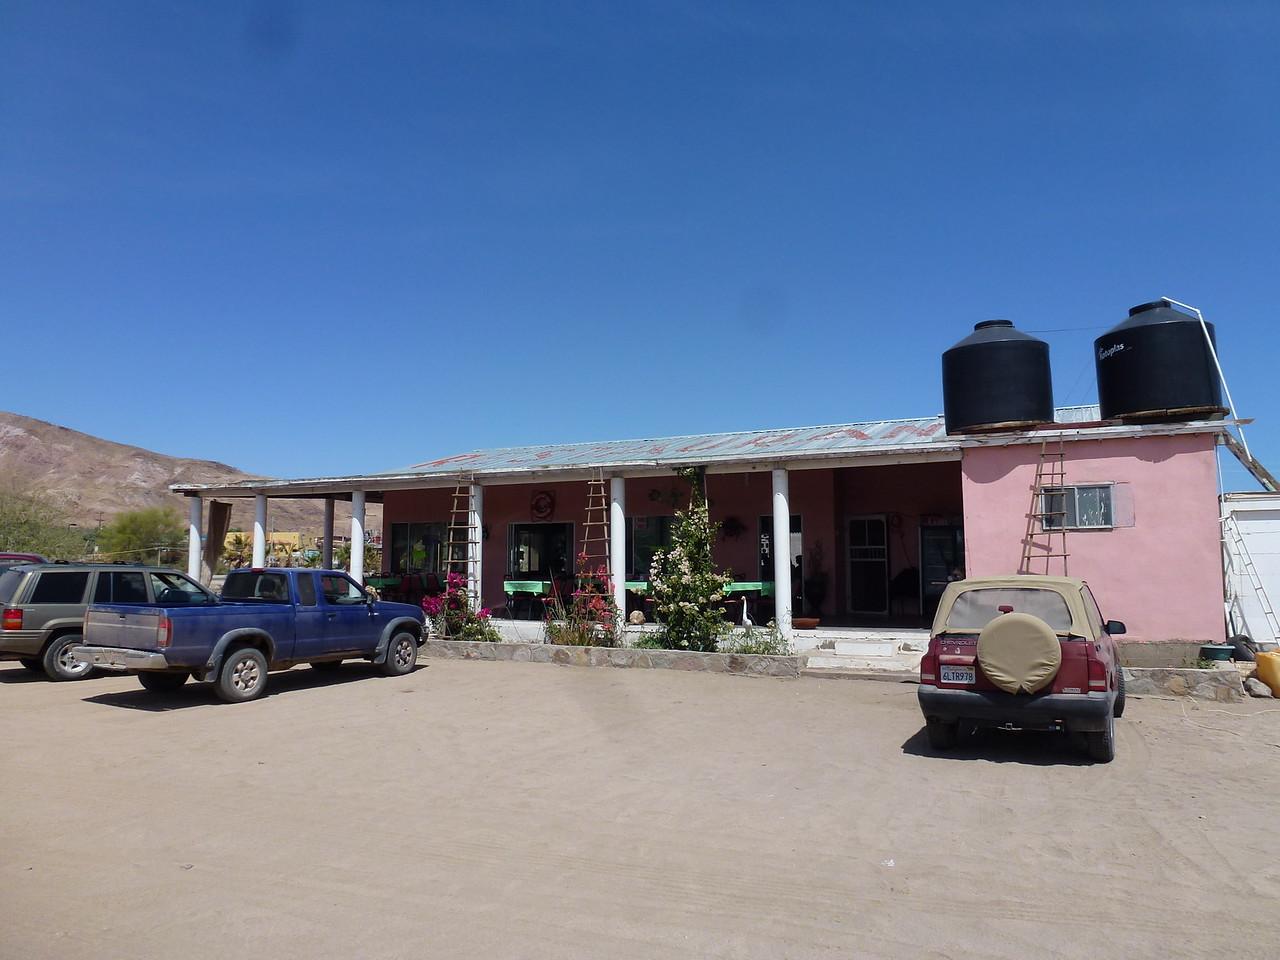 Had breakfast here at Alejandrina's place in Bahia